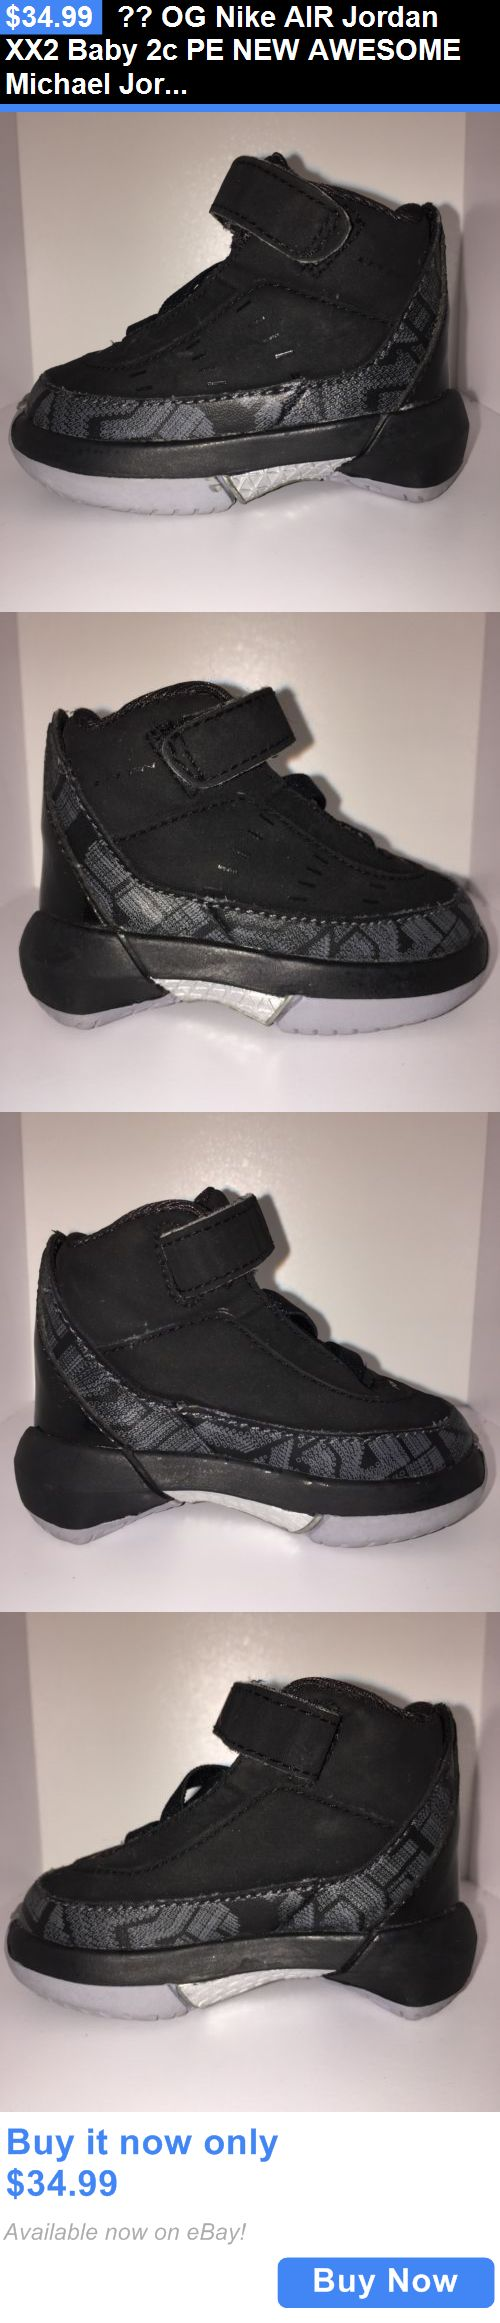 Michael Jordan Baby Clothing: ?? Og Nike Air Jordan Xx2 Baby 2C Pe New Awesome Michael Jordan Basketball Bulls BUY IT NOW ONLY: $34.99